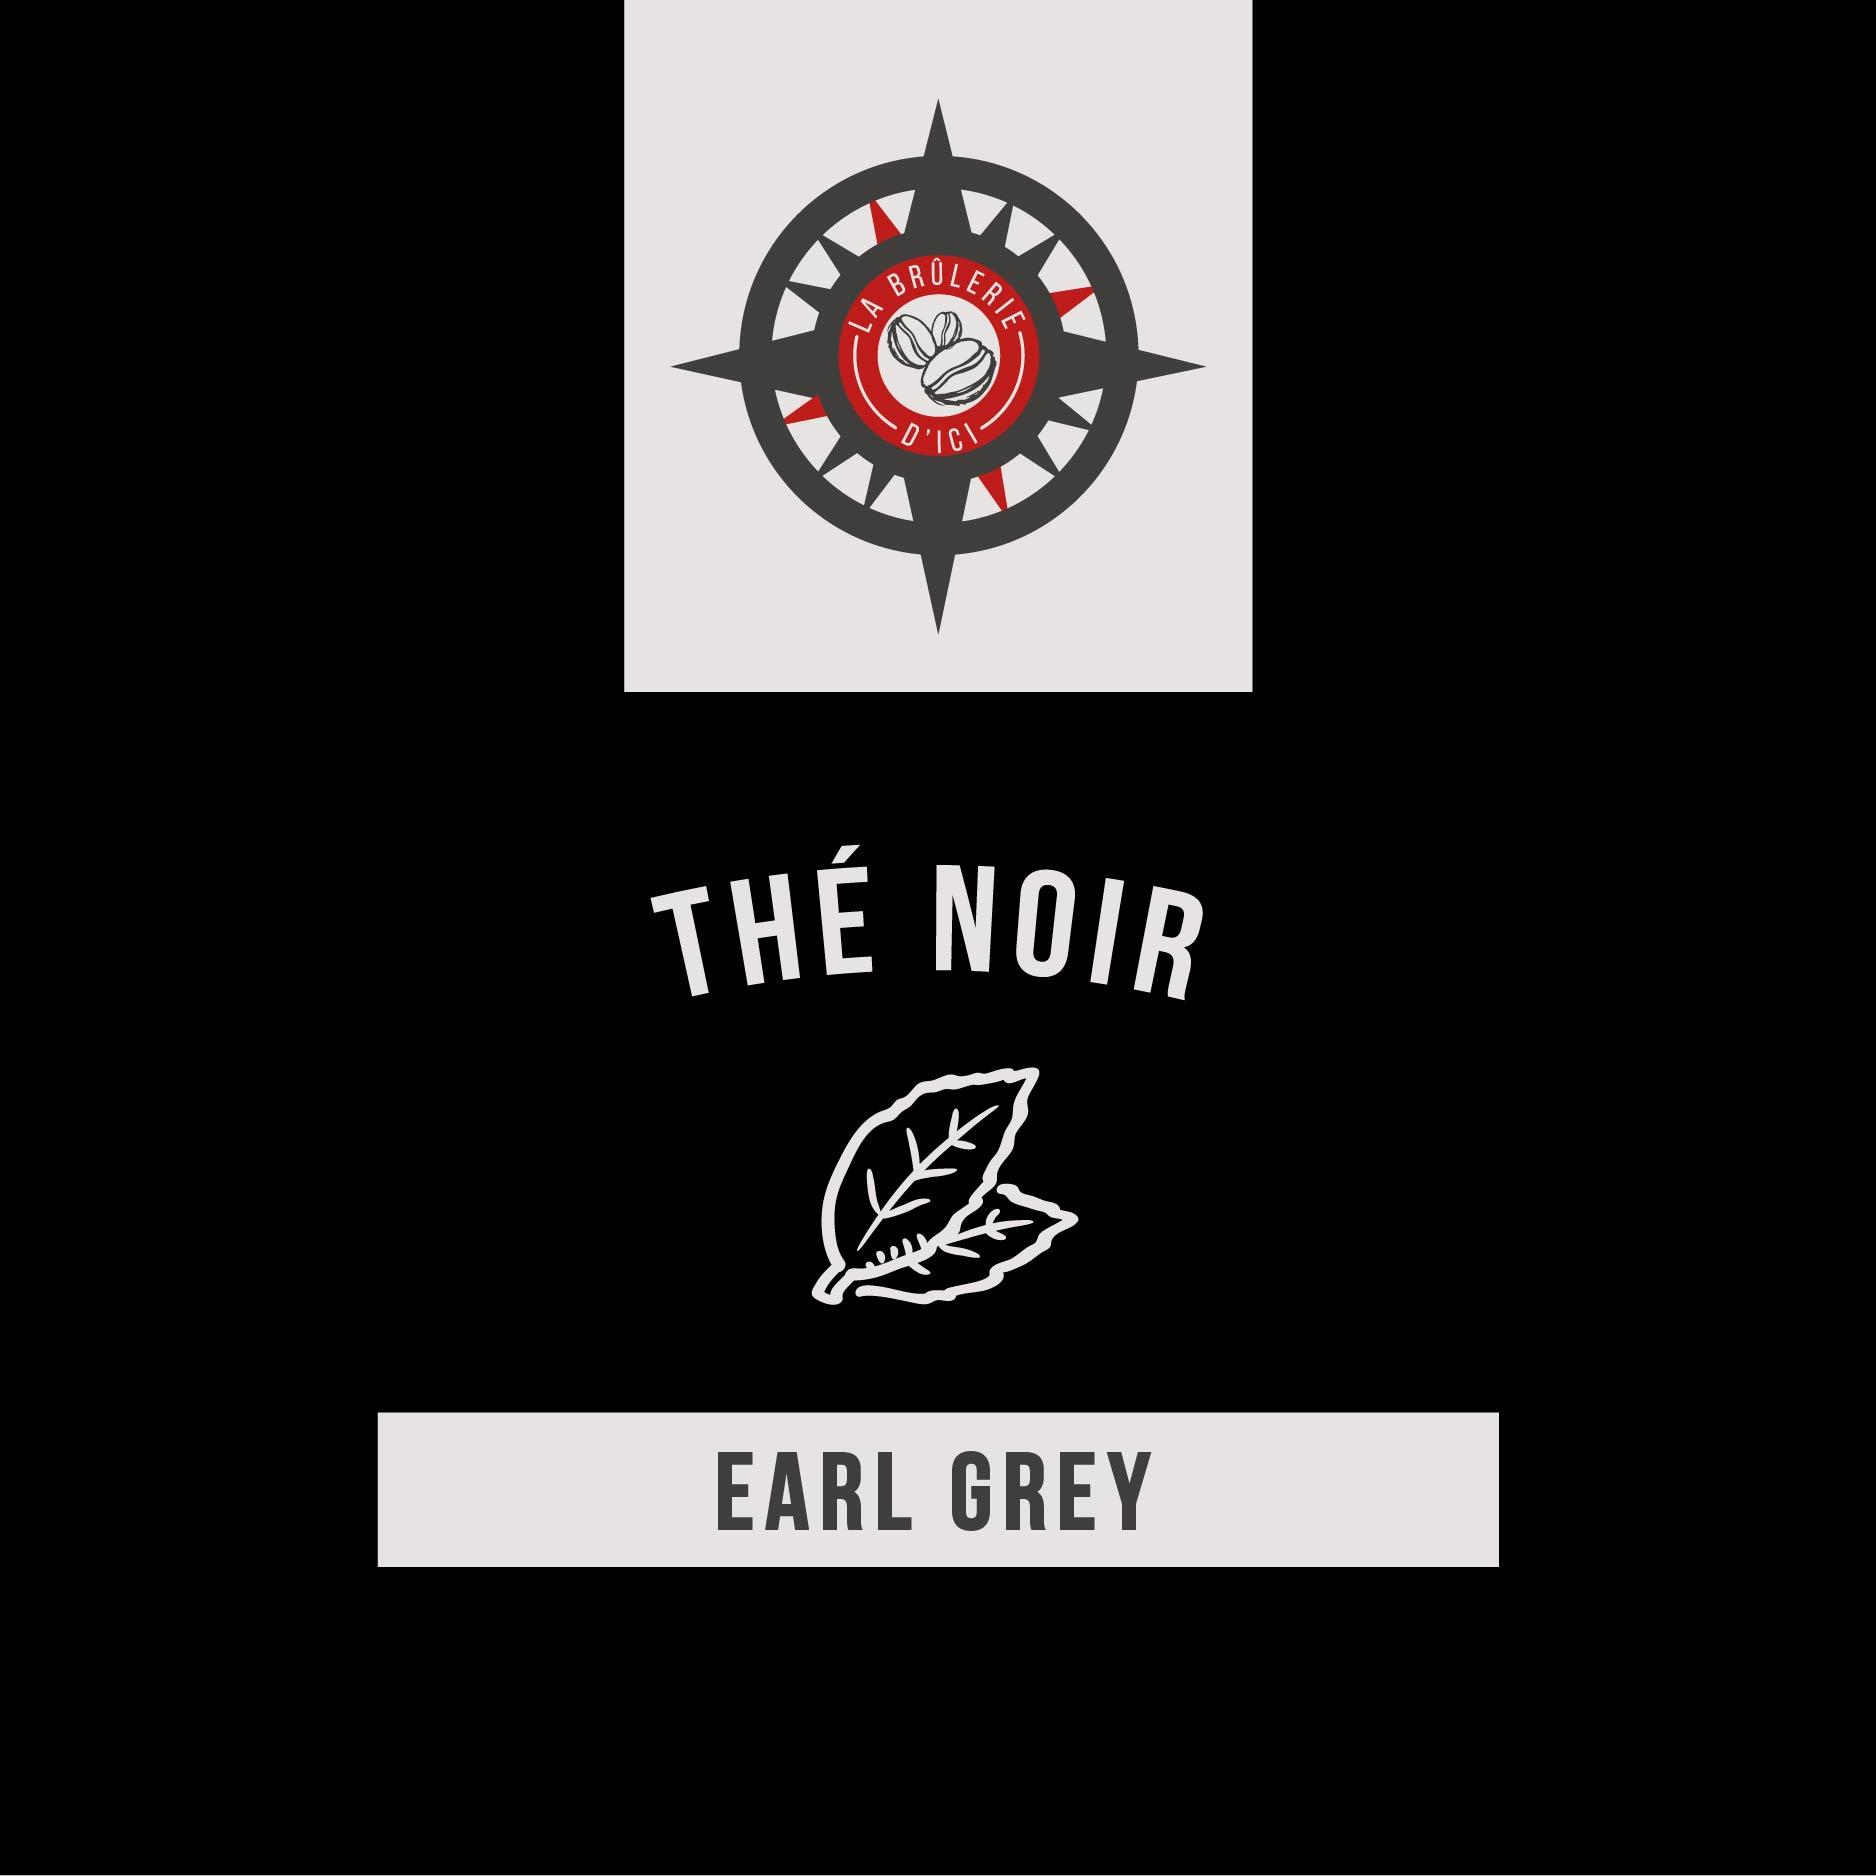 Earl Grey - Thé et tisane